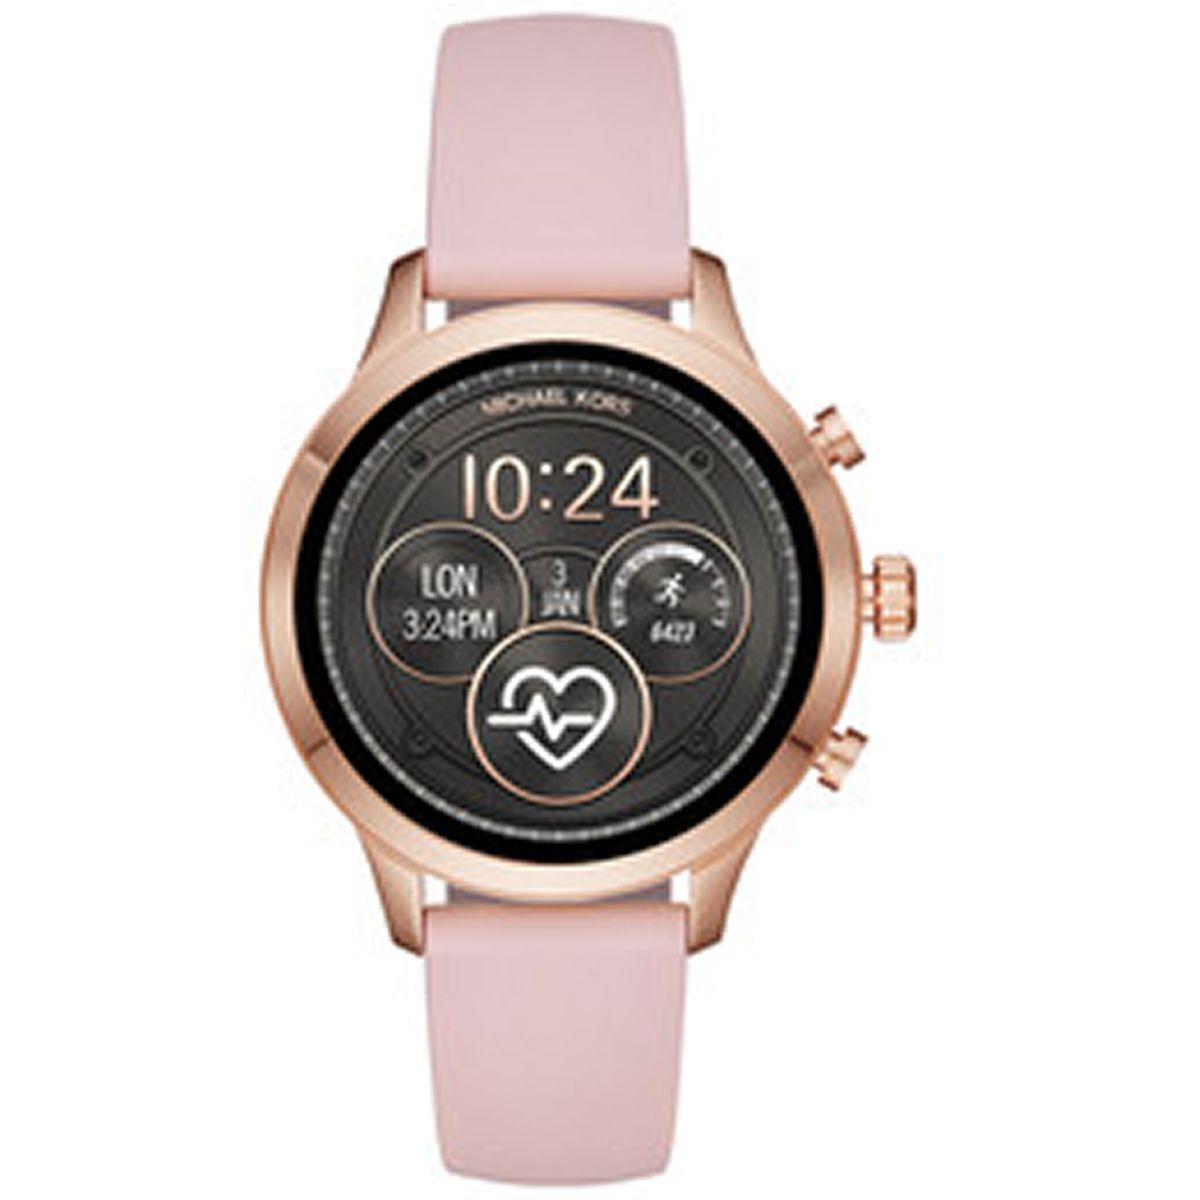 new styles 6f48d 5297e Michael Kors Watches - Macys